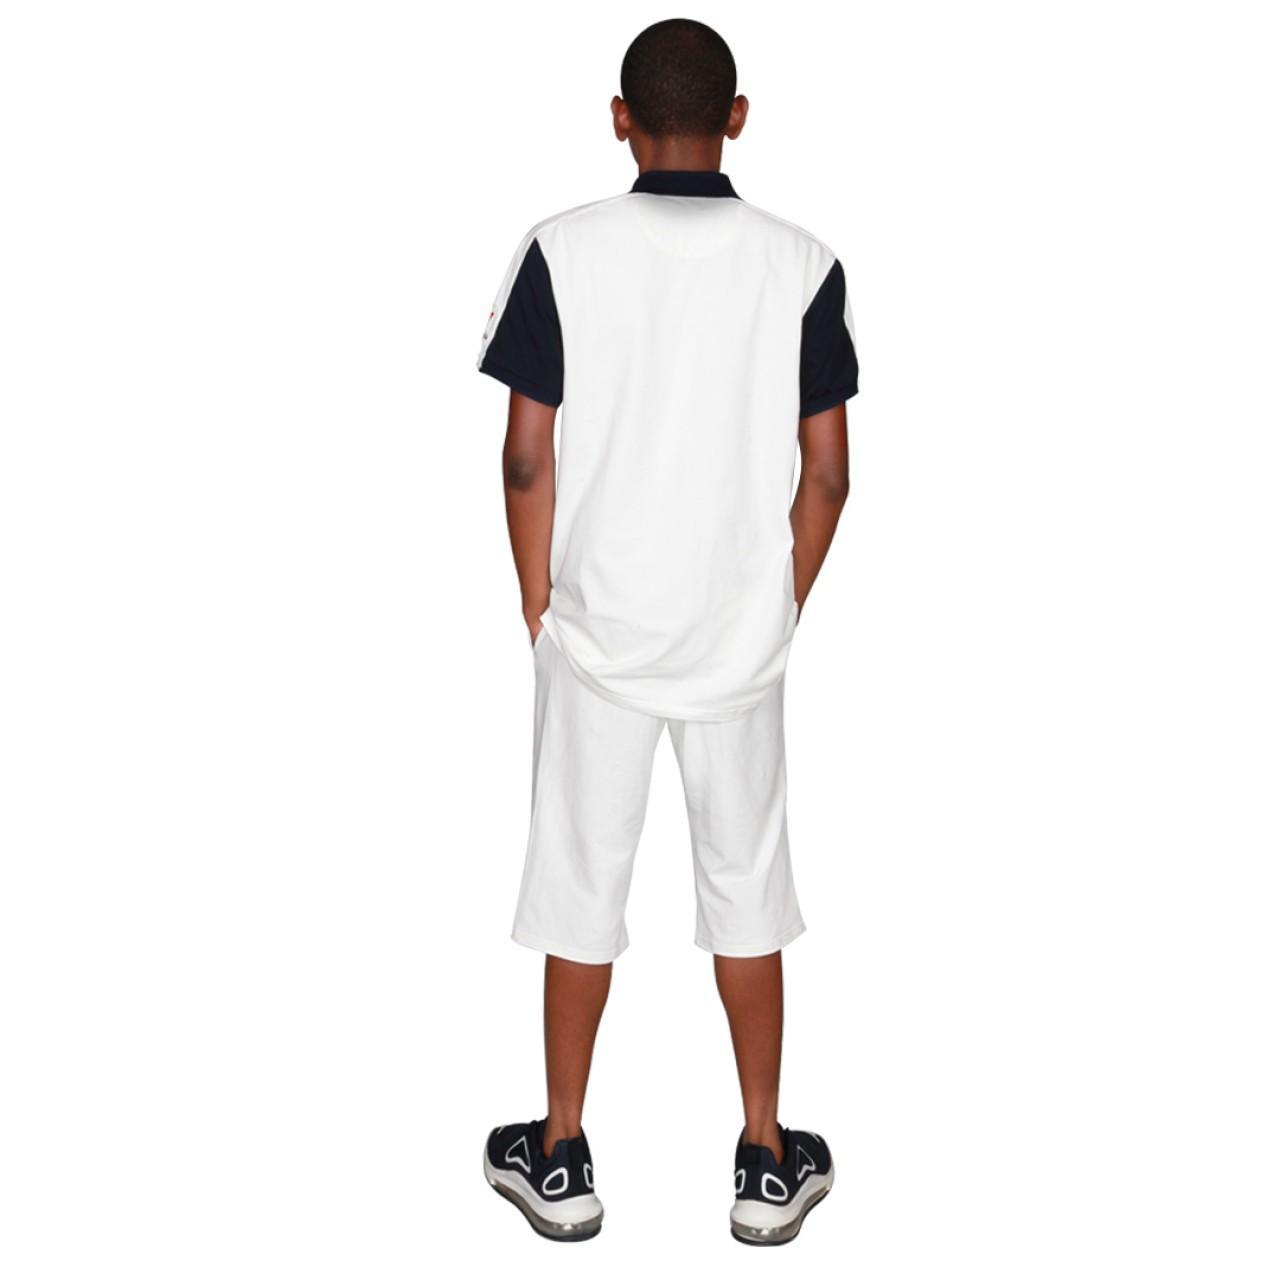 Zeekas Mens Brisco Park Rugby Club Short Sleeve With Logo Design For Polo Shirt